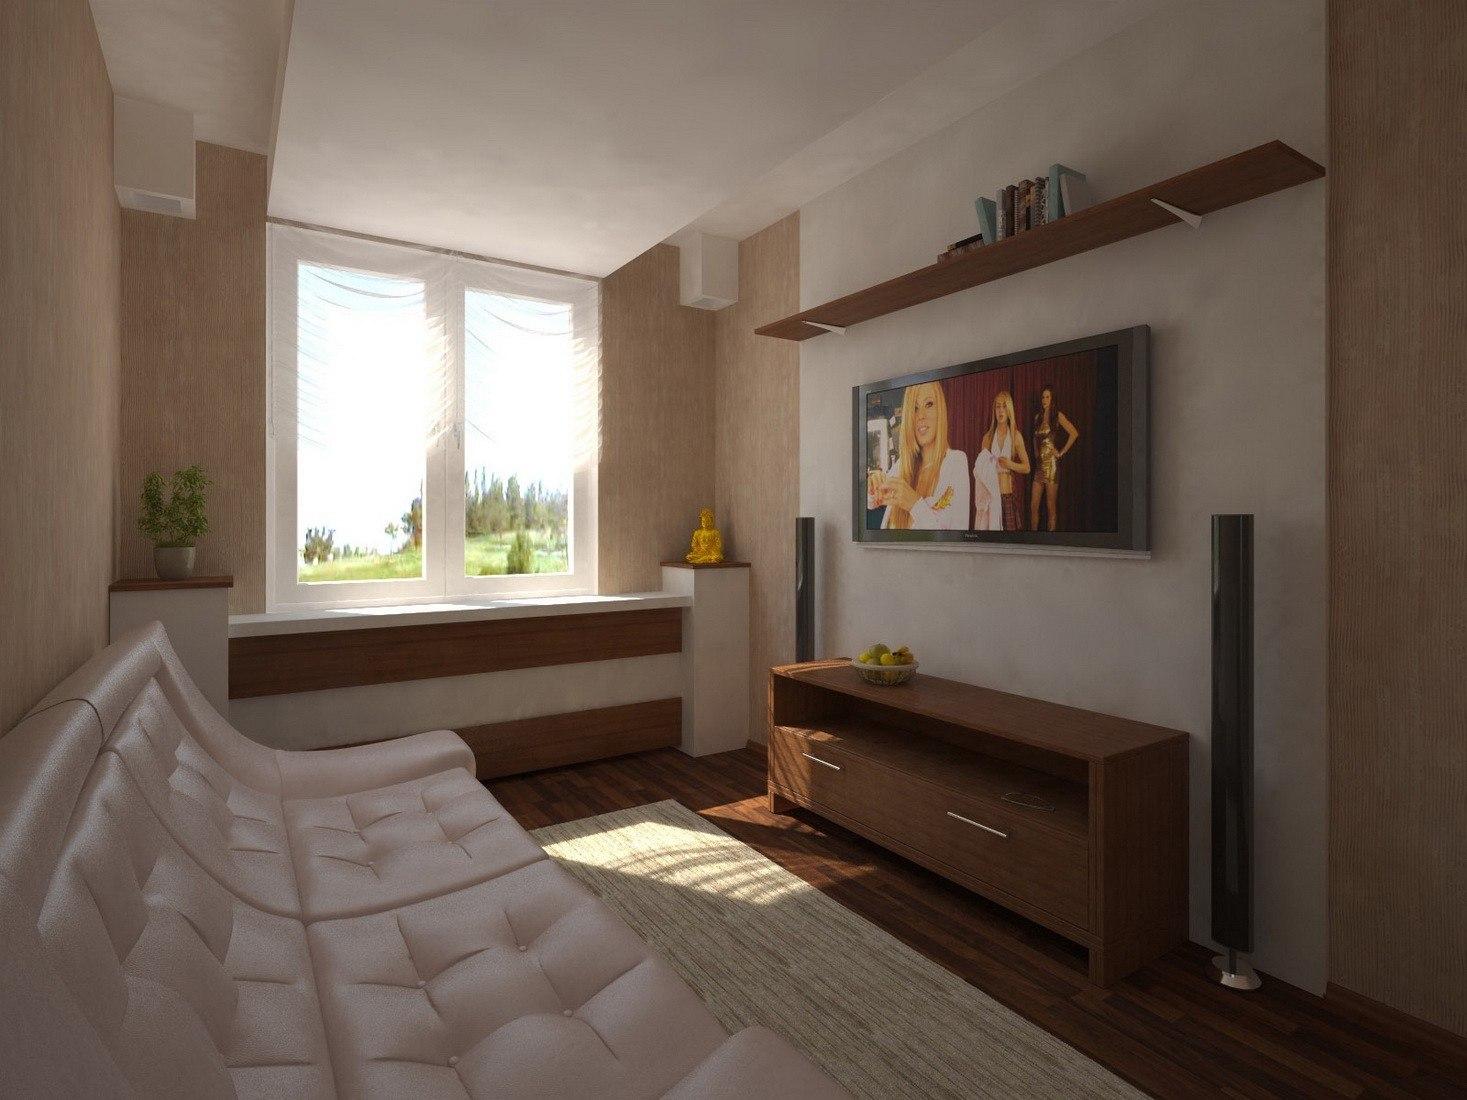 Онлайн 3д дизайн комнаты